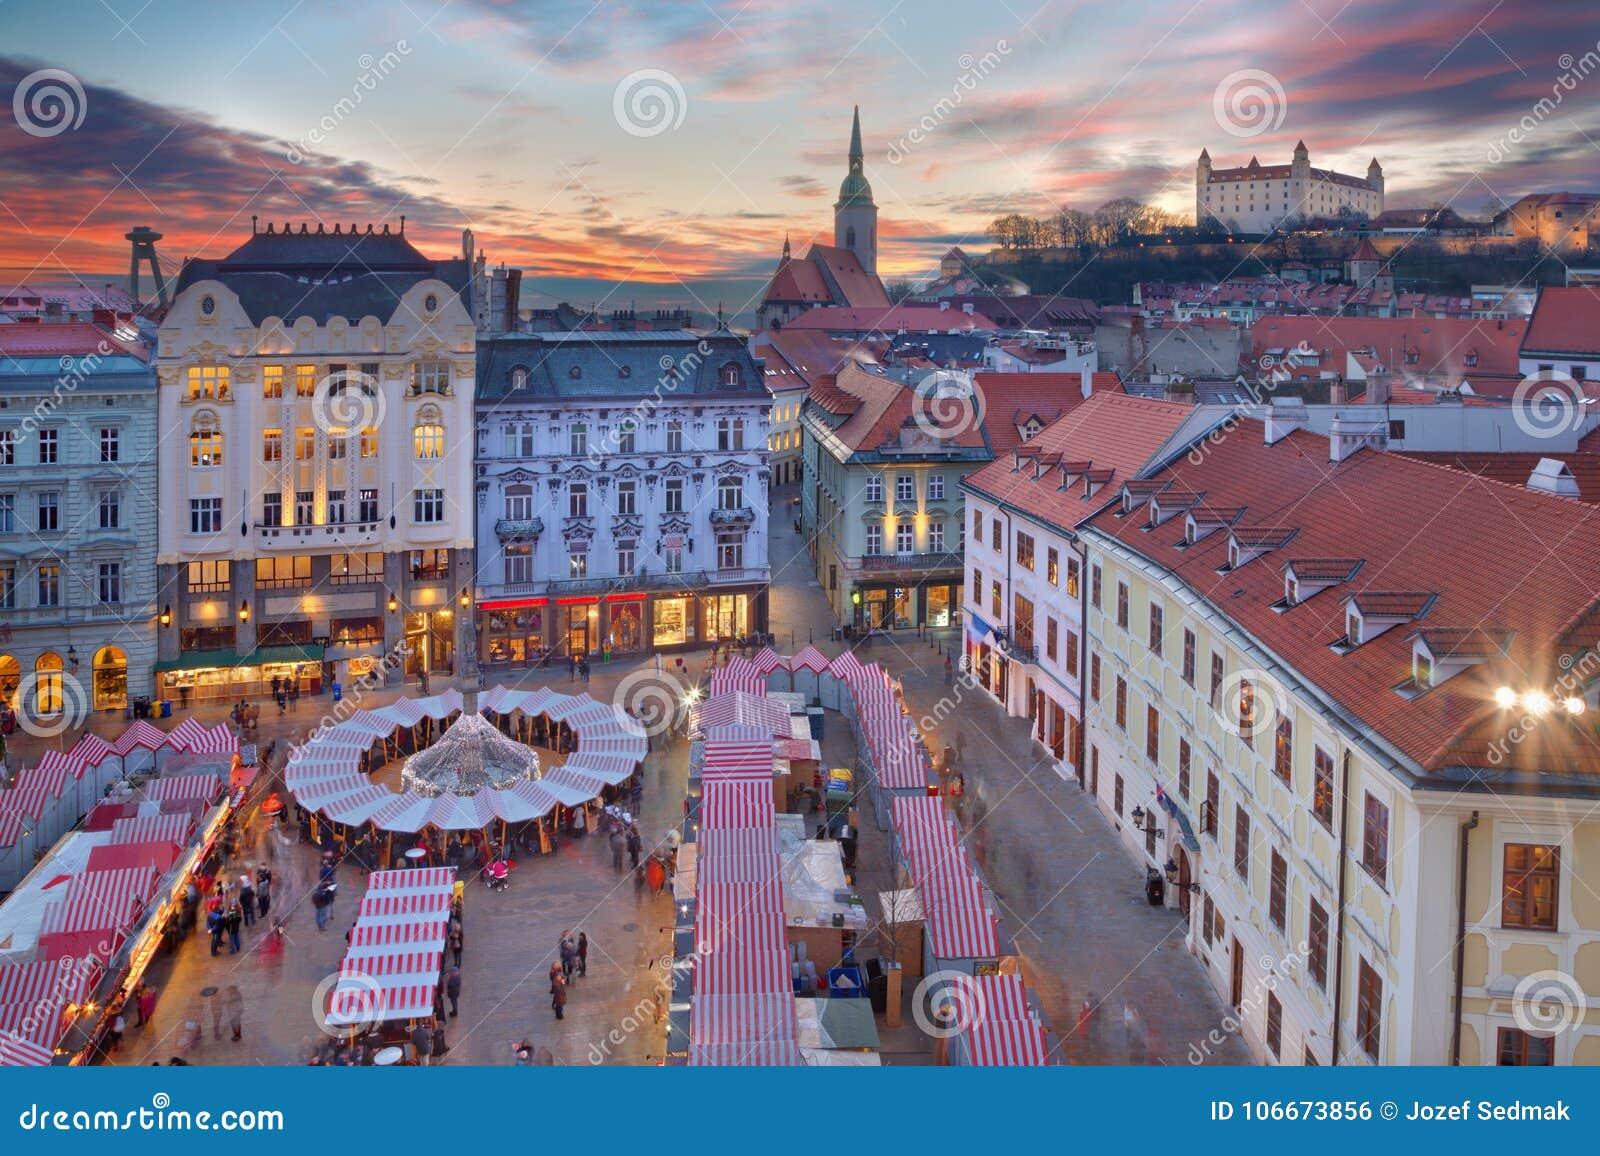 Christmas Bratislava.Bratislava Christmas Market On The Main Square In Evening